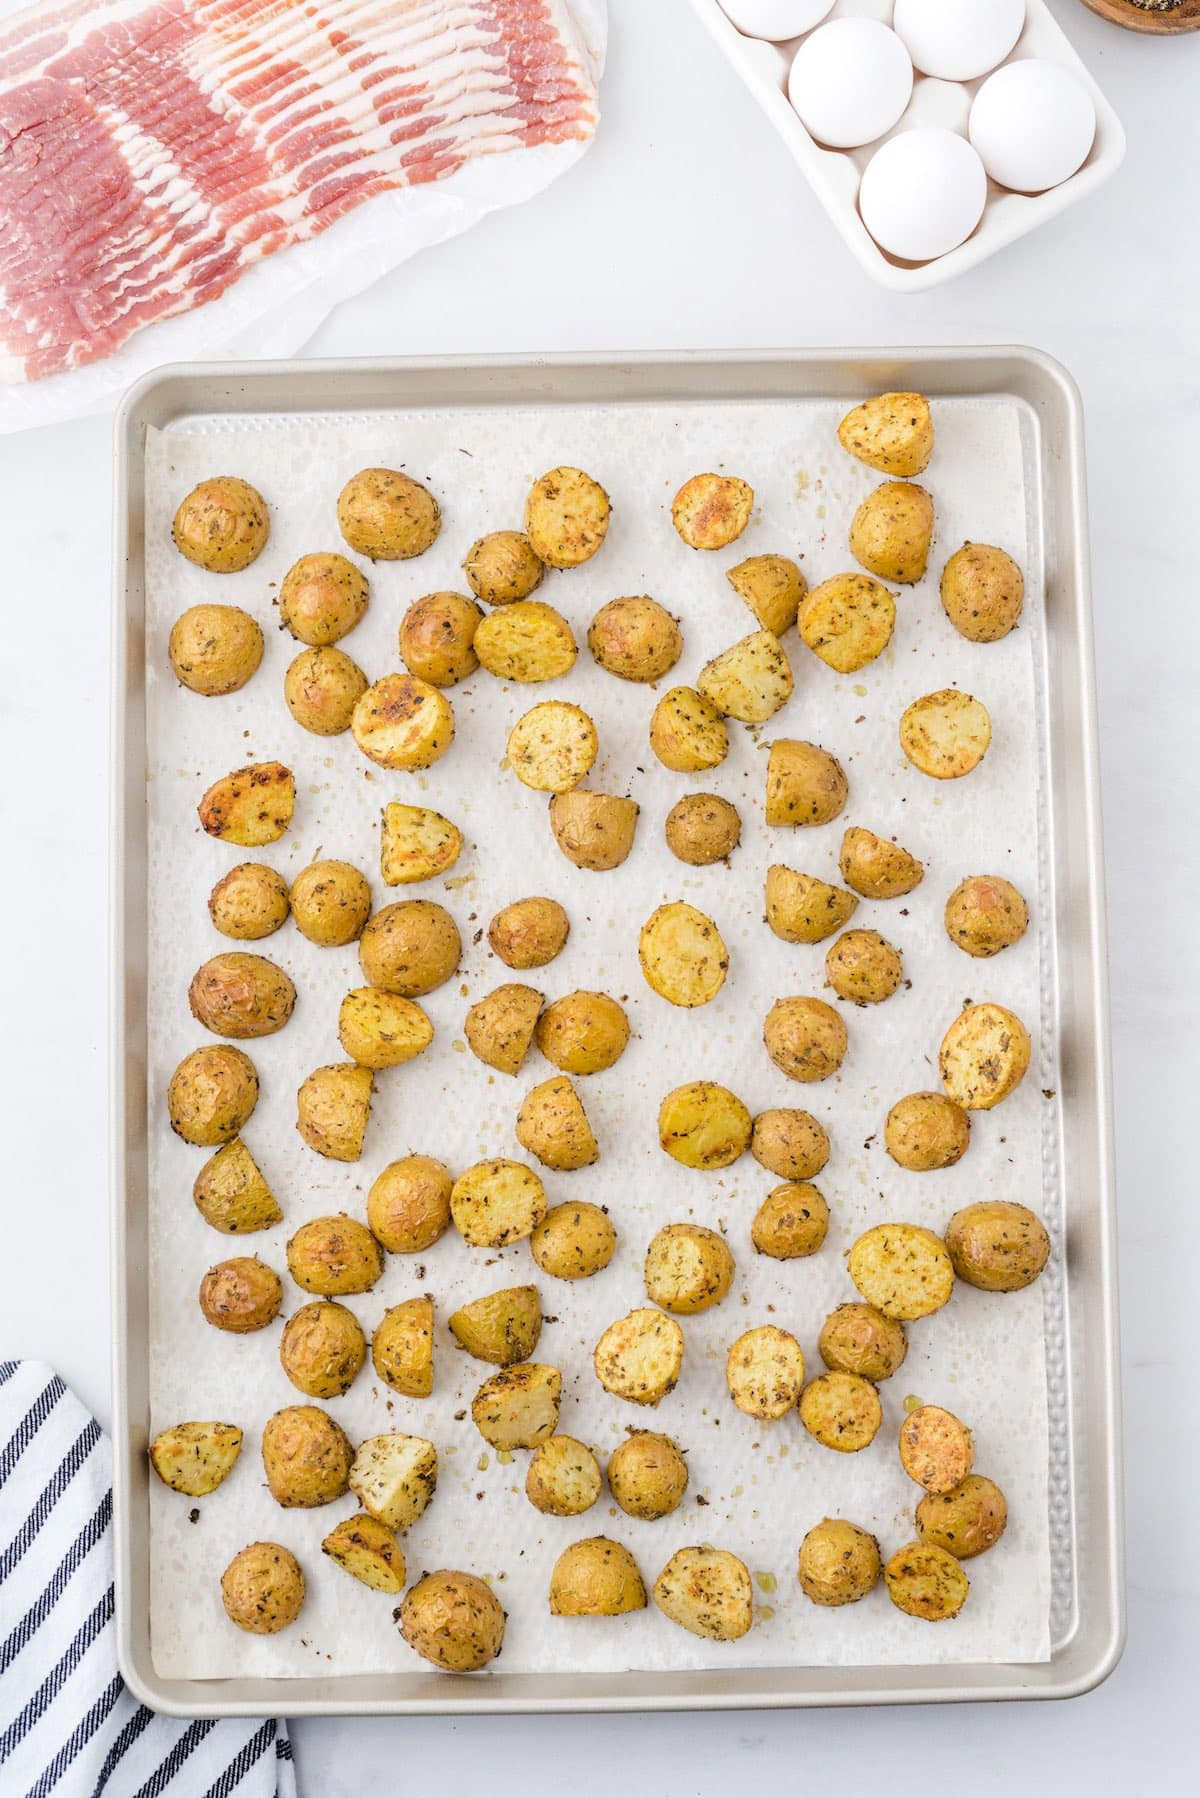 spread potatoes in baking pan